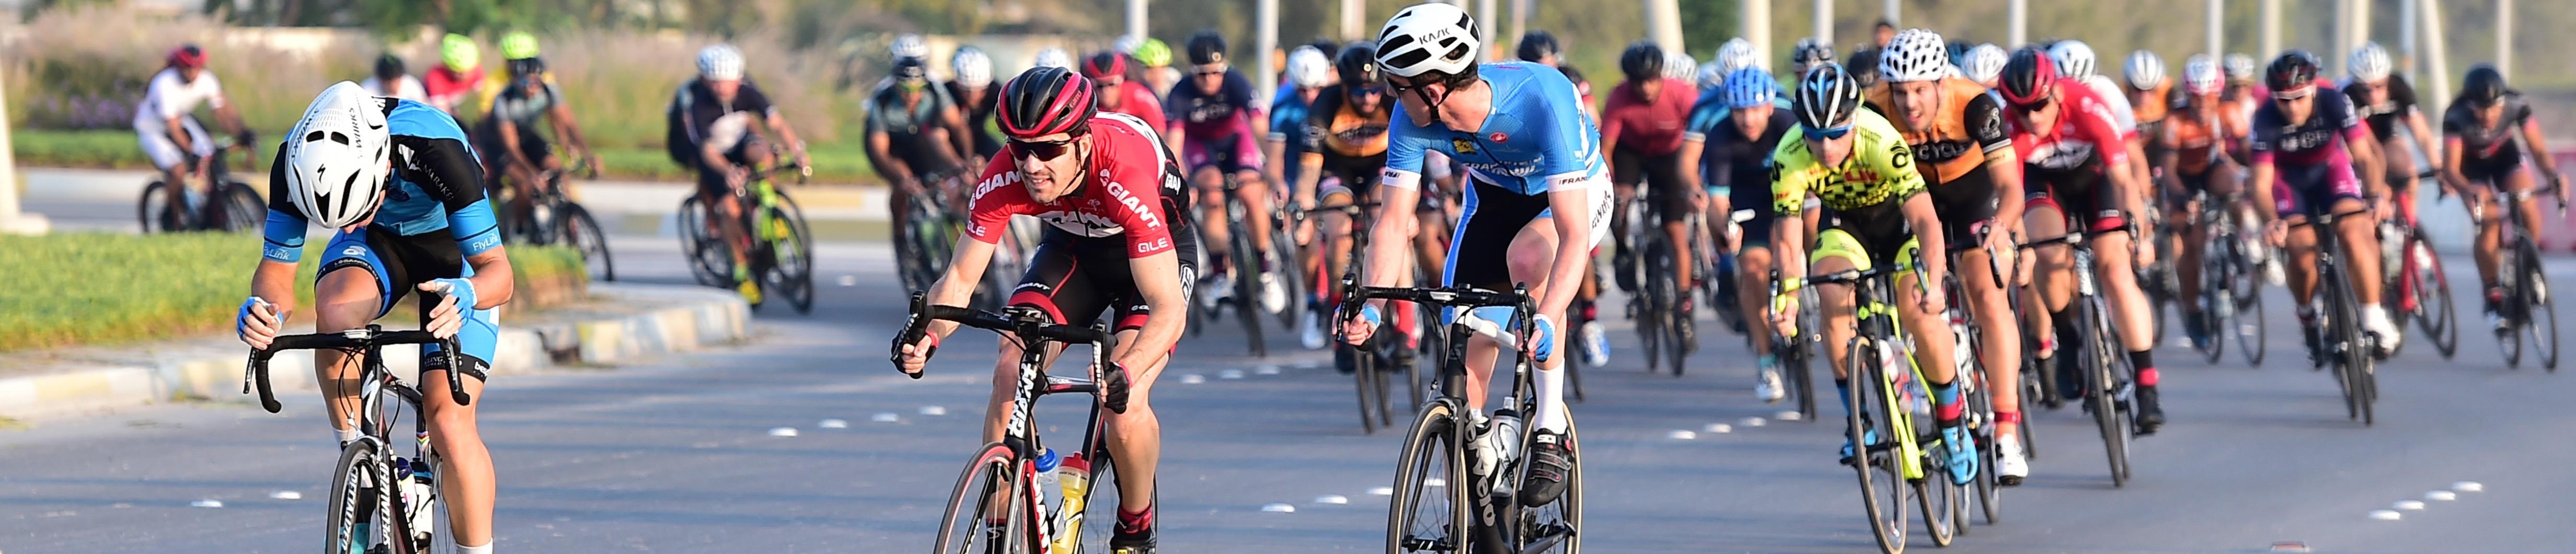 my race|result : : Abu Dhabi Sports Council Yas Island Cycle